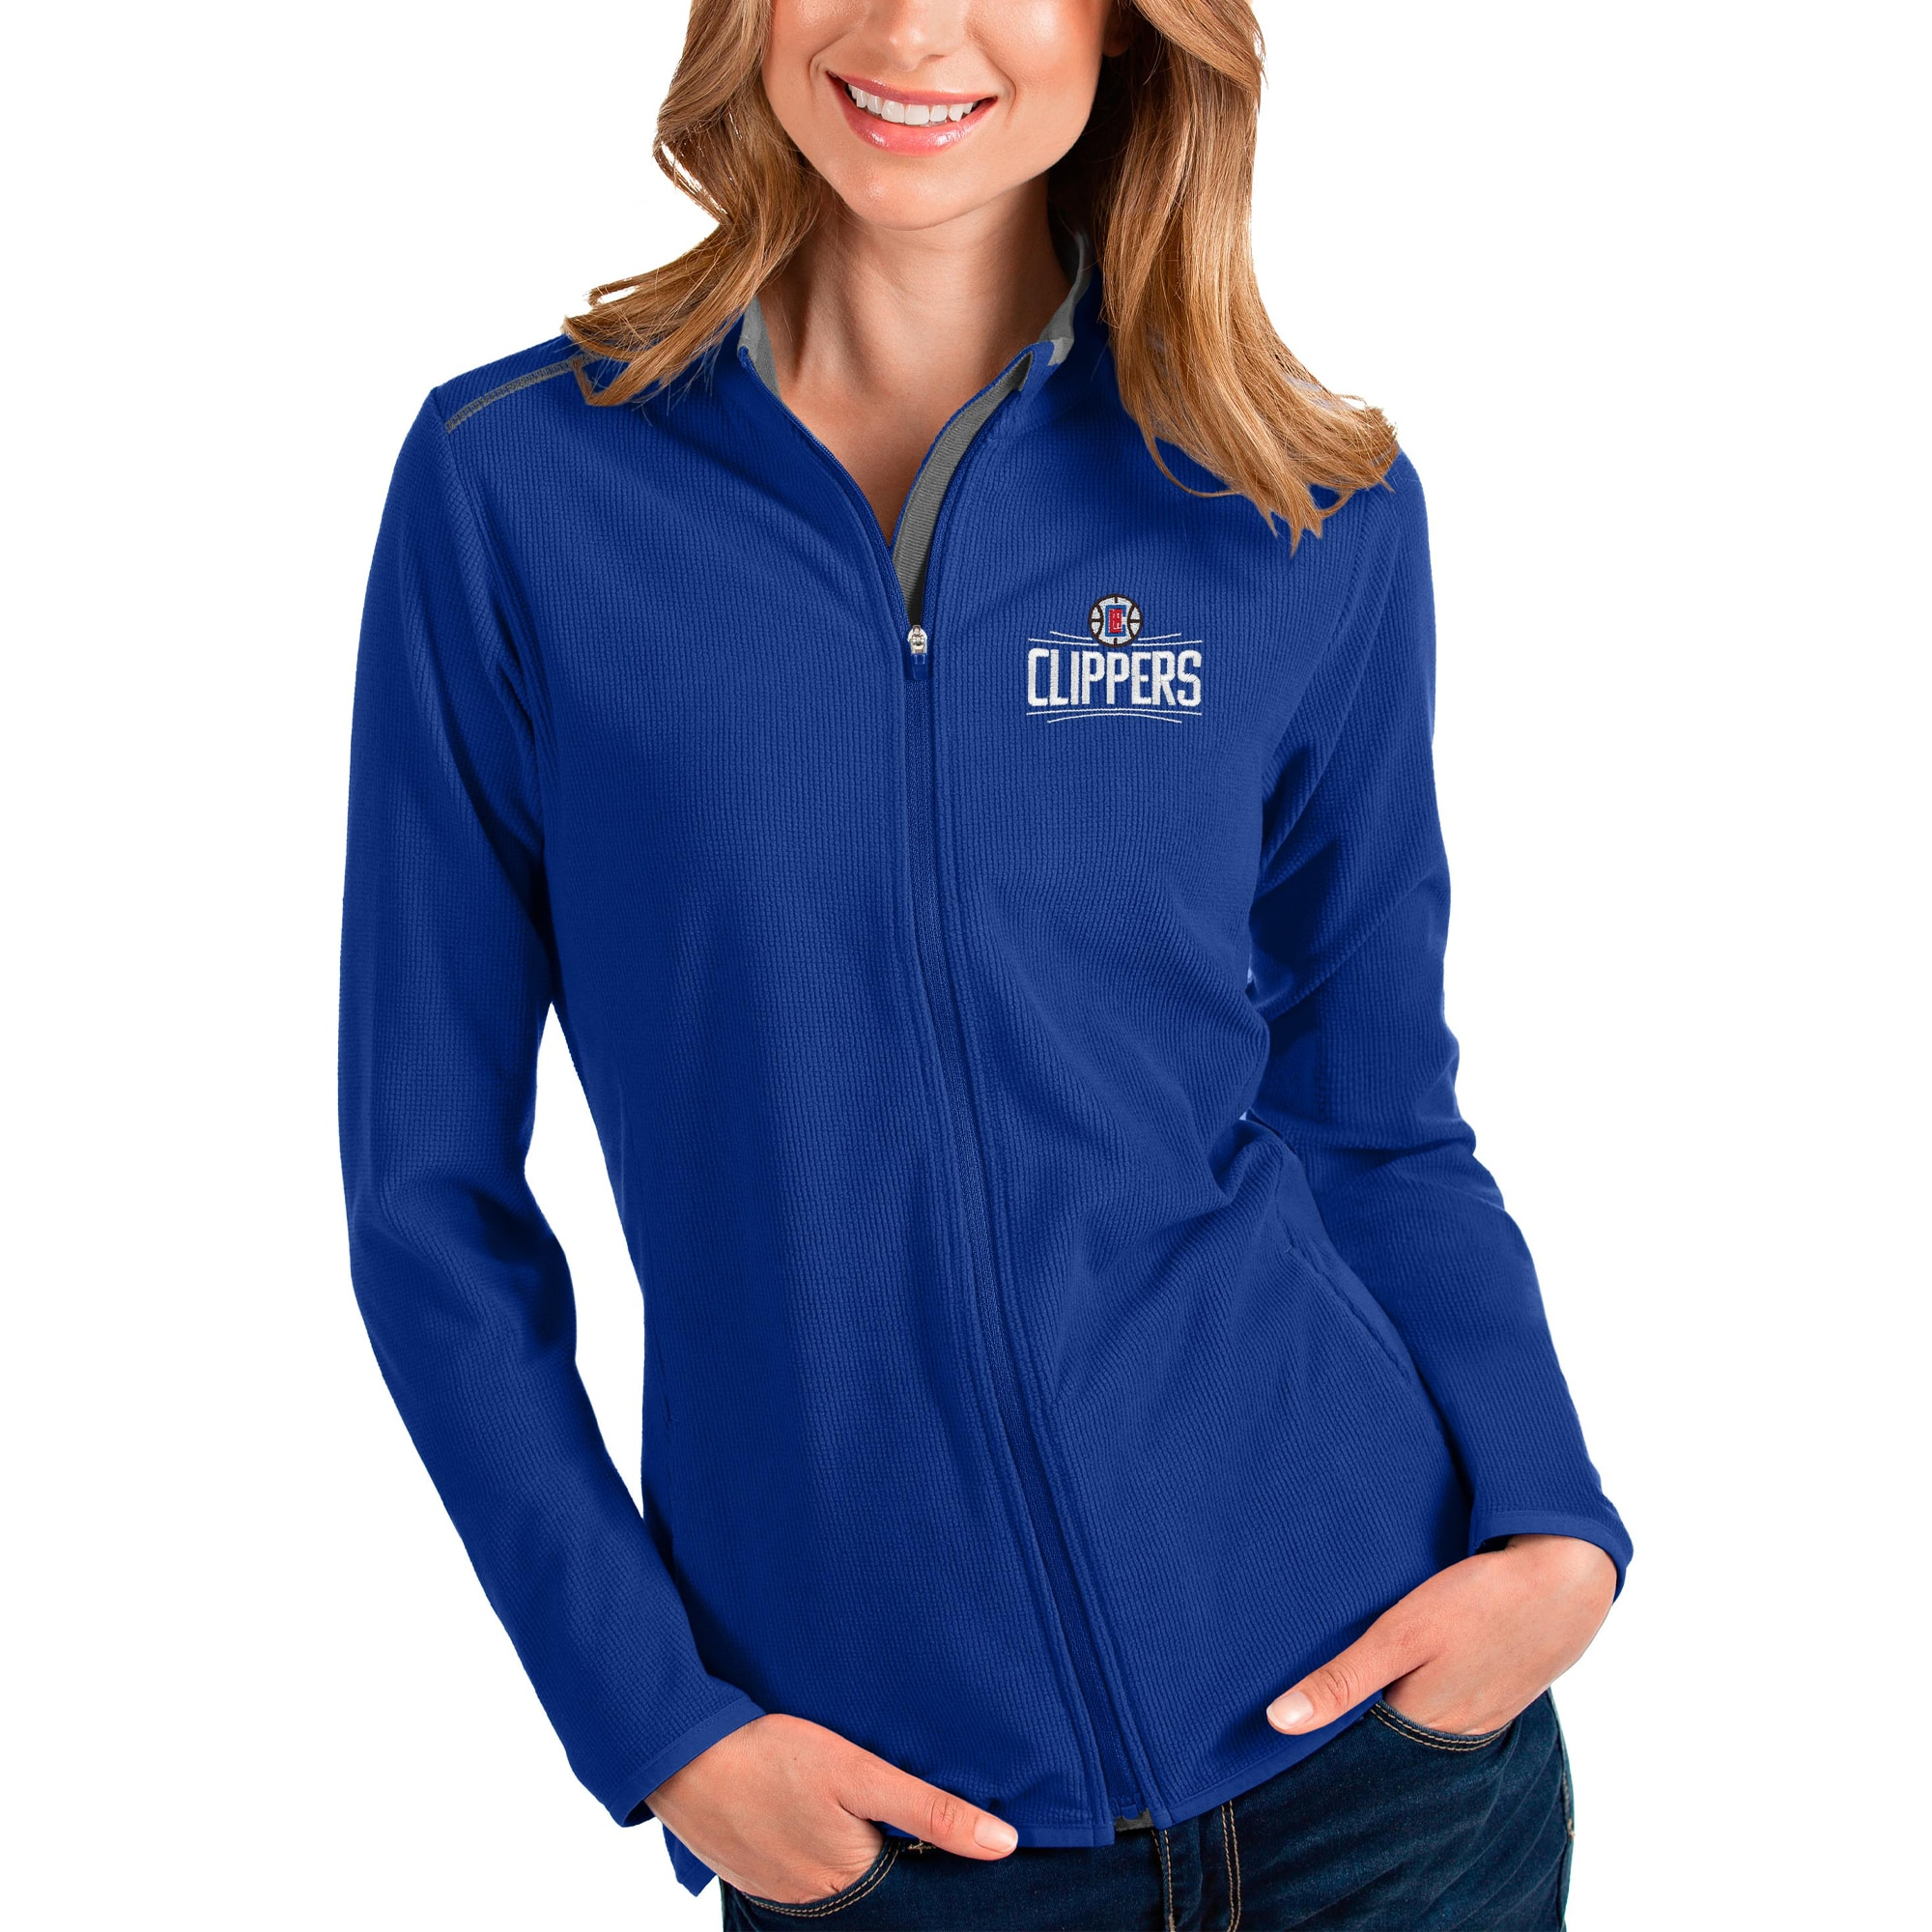 LA Clippers Antigua Women's Glacier Full-Zip Jacket - Royal/Gray